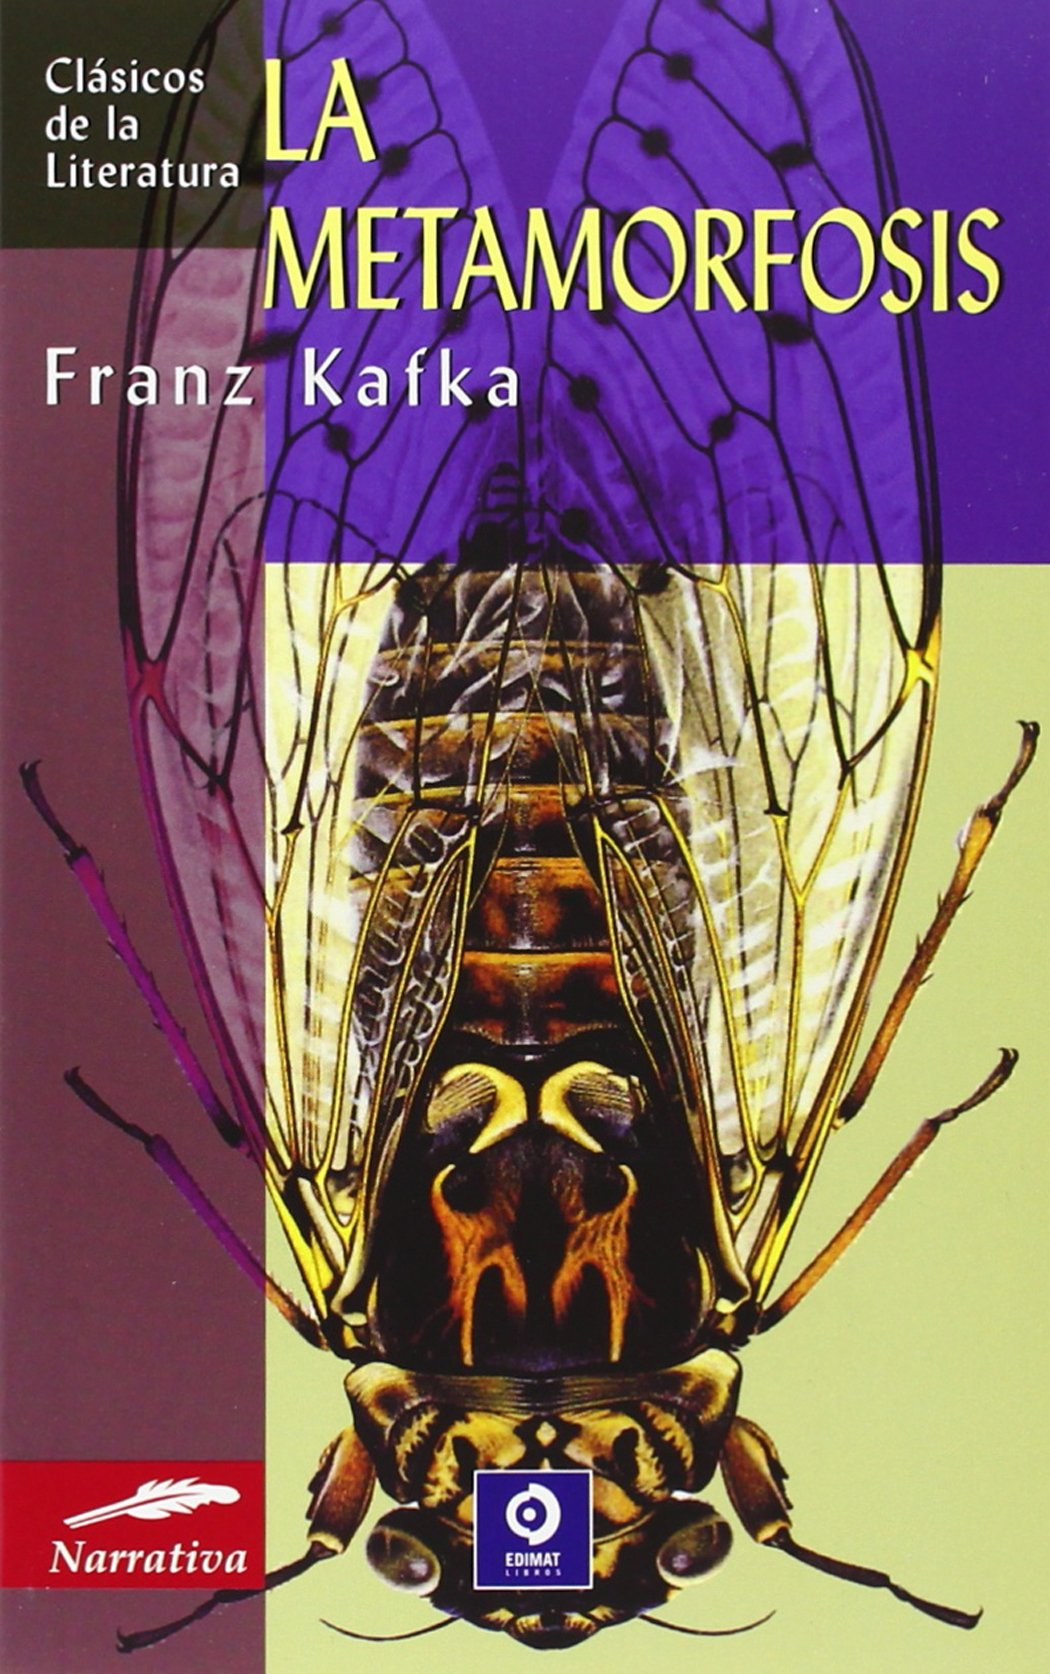 Amazon.com: La Metamorfosis (Clásicos de la literatura series) (Spanish  Edition) (9788497643474): Franz Kafka: Books